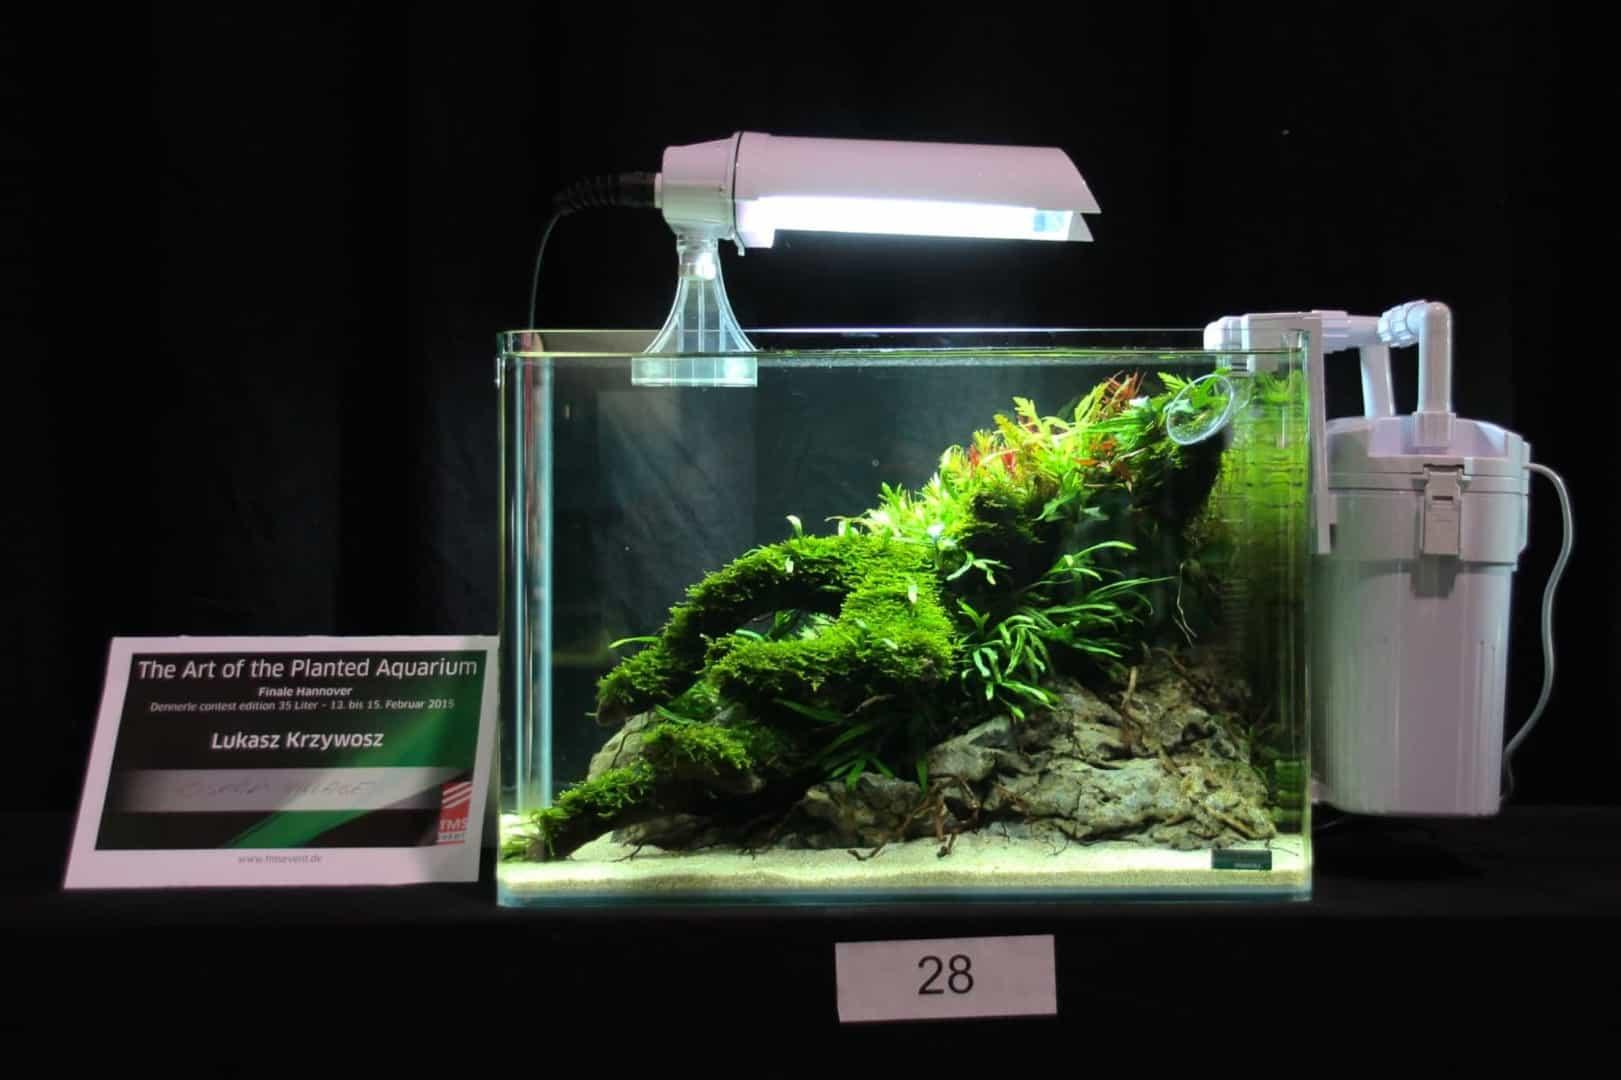 Heimtiermesse Hannover 2015 - THE ART OF THE PLANTED AQUARIUM 53